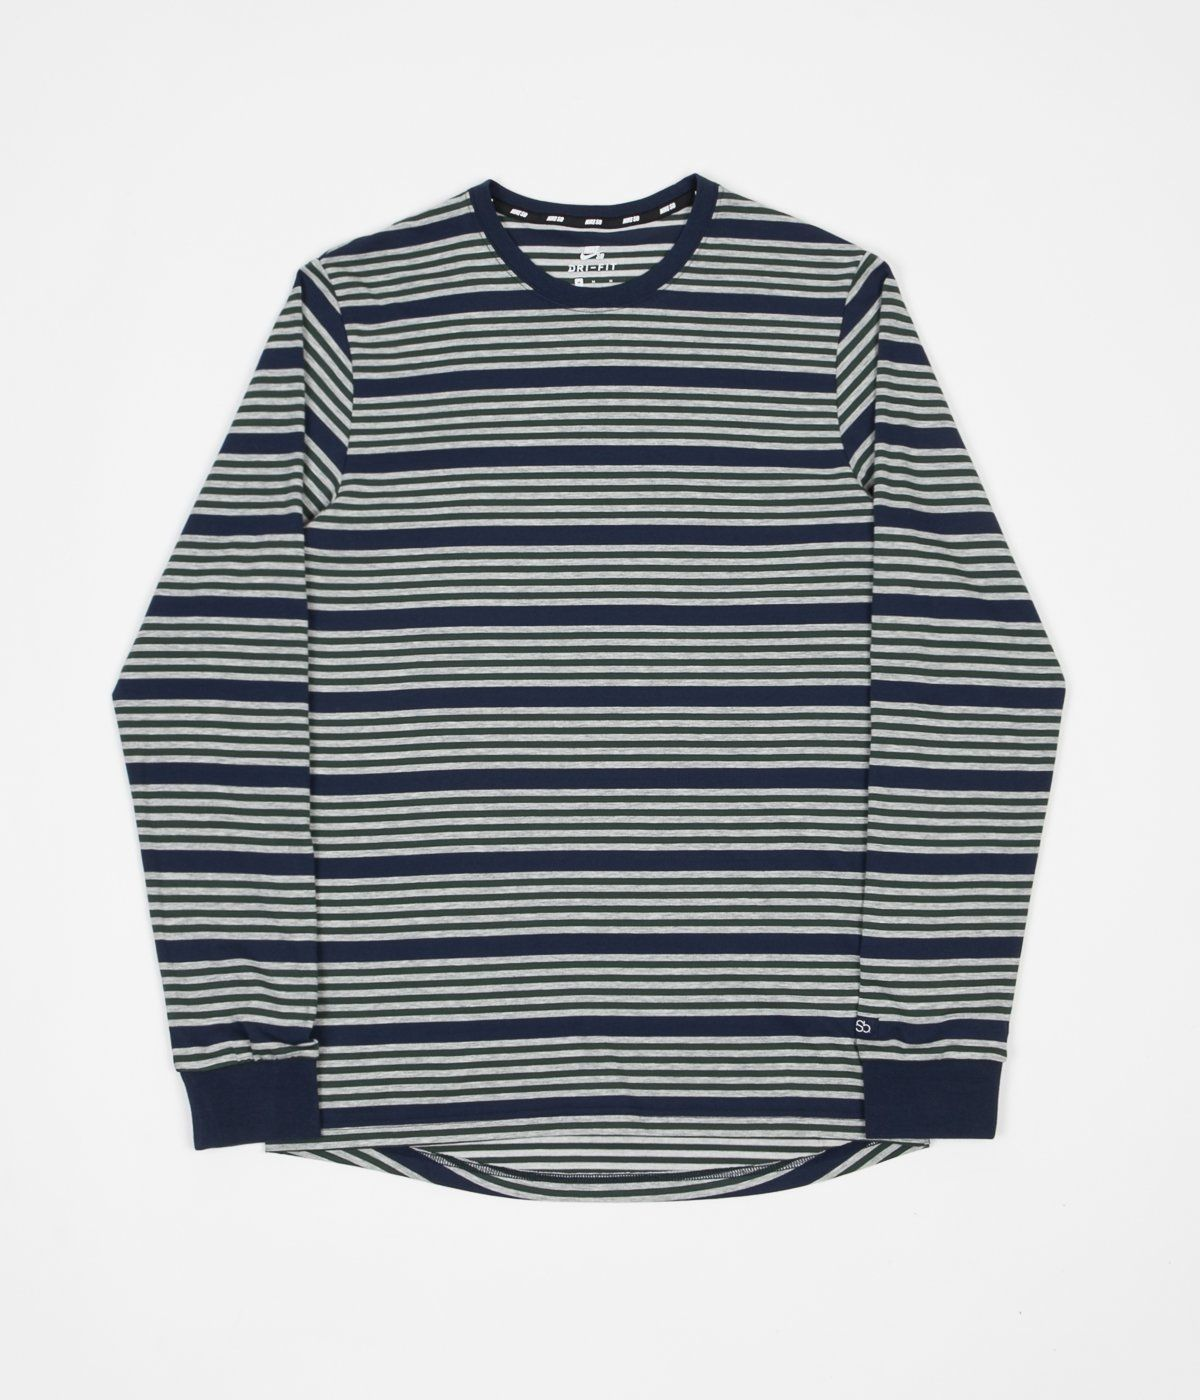 feb51f8e Nike SB Stripe Long Sleeve T-Shirt - Obsidian / Obsidian | Wishlist ...